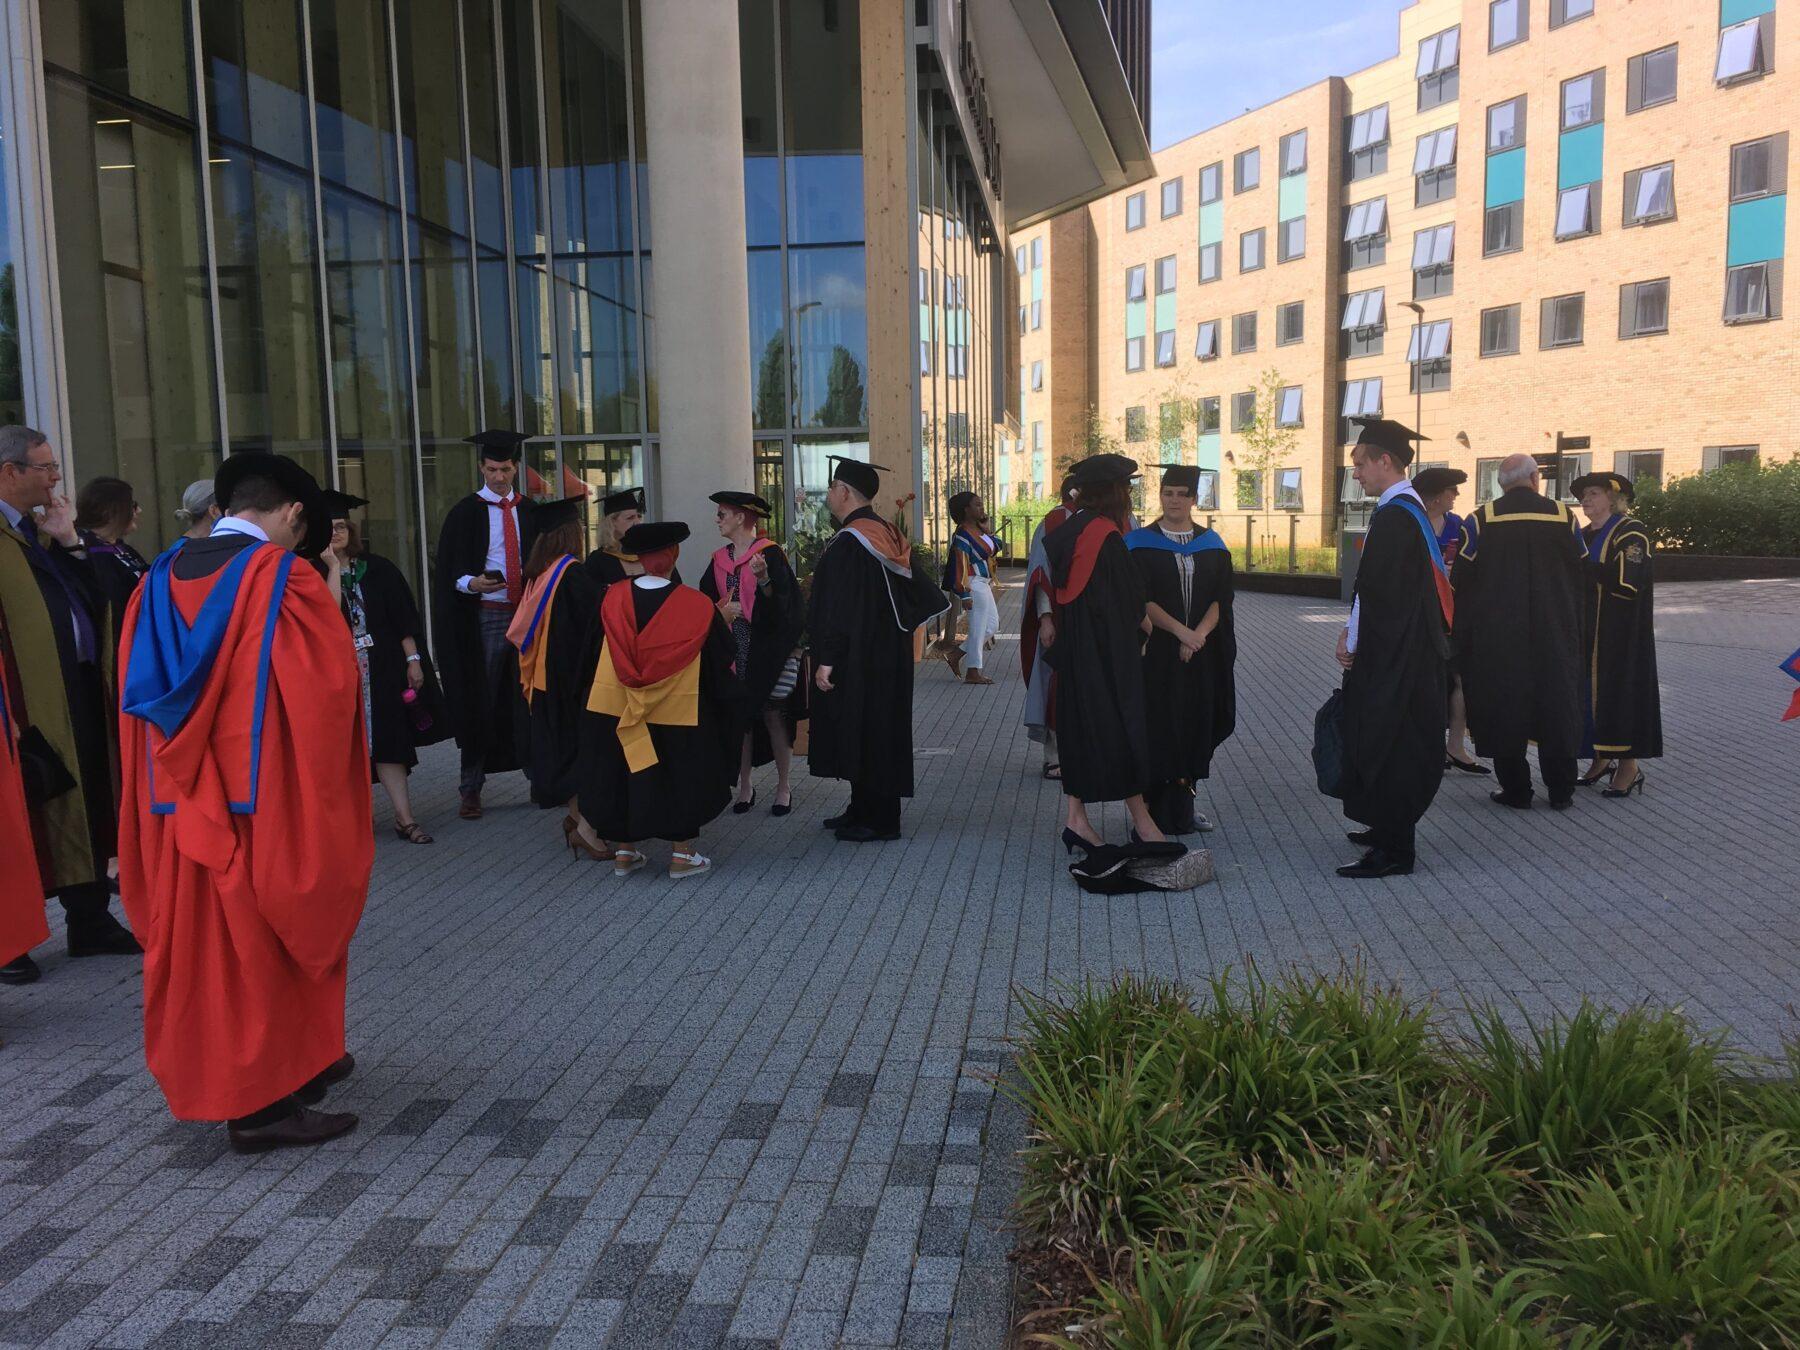 Graduation day at the university of Northampton